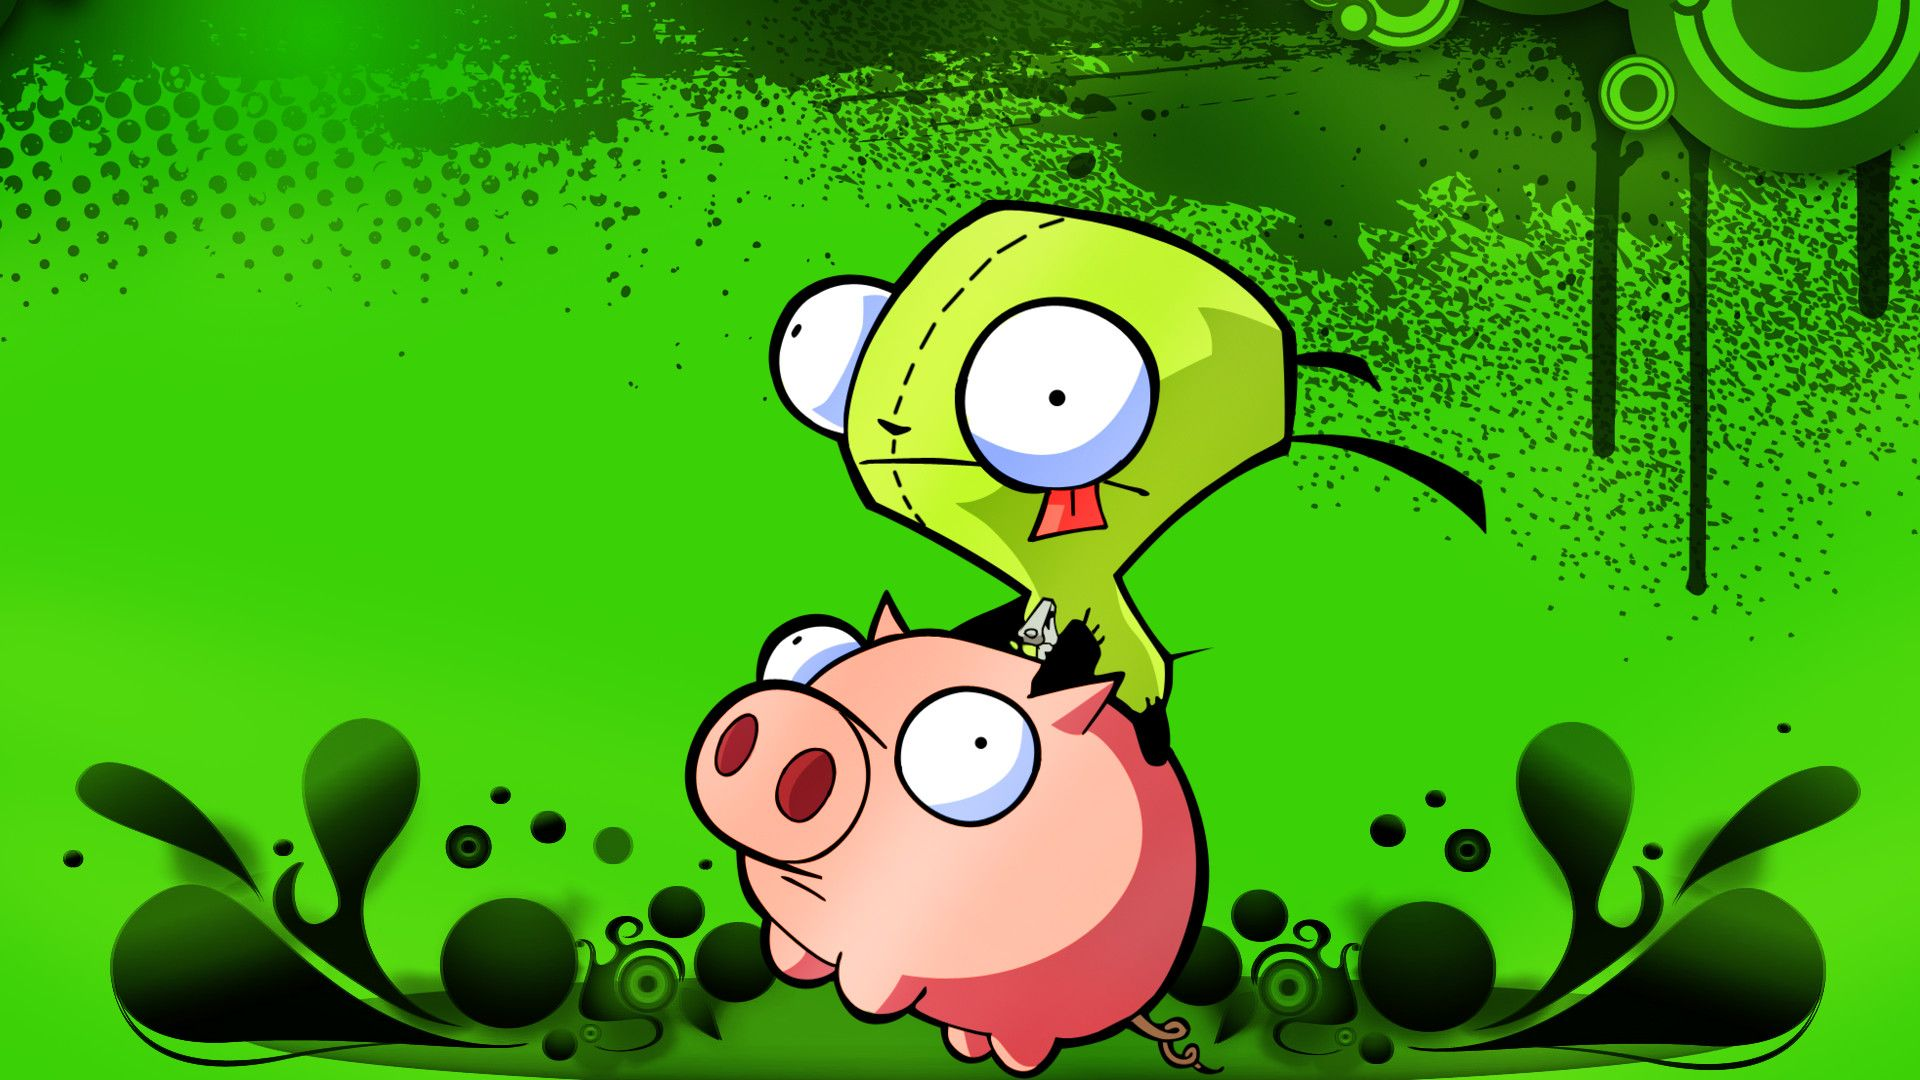 Cute Invader Zim Wallpapers - Top Free Cute Invader Zim ...